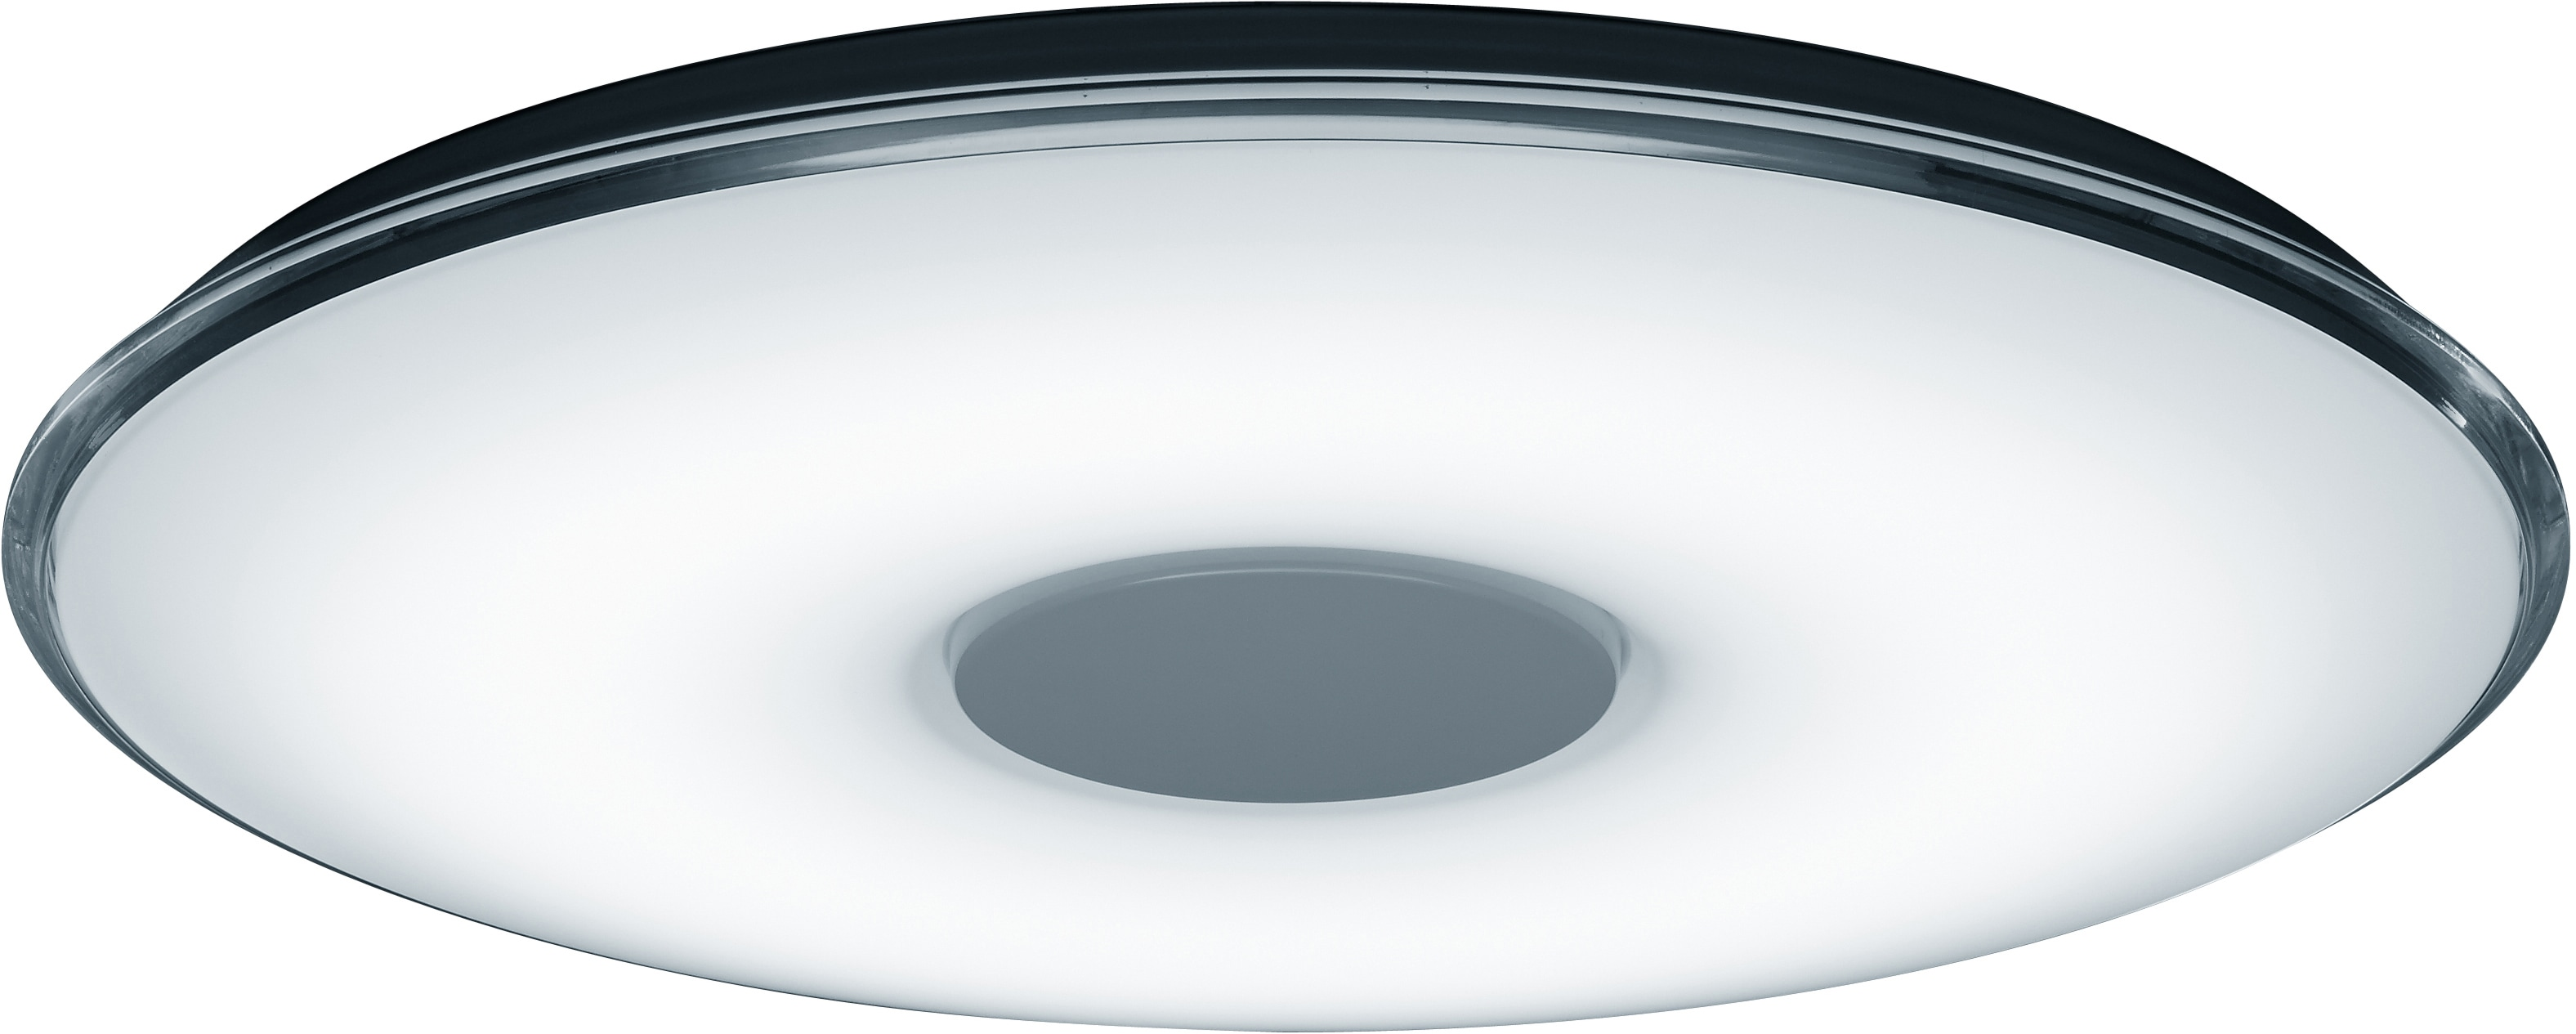 rabatt trio leuchten led deckenleuchte tokyo led 50 w 60 dimmbar. Black Bedroom Furniture Sets. Home Design Ideas